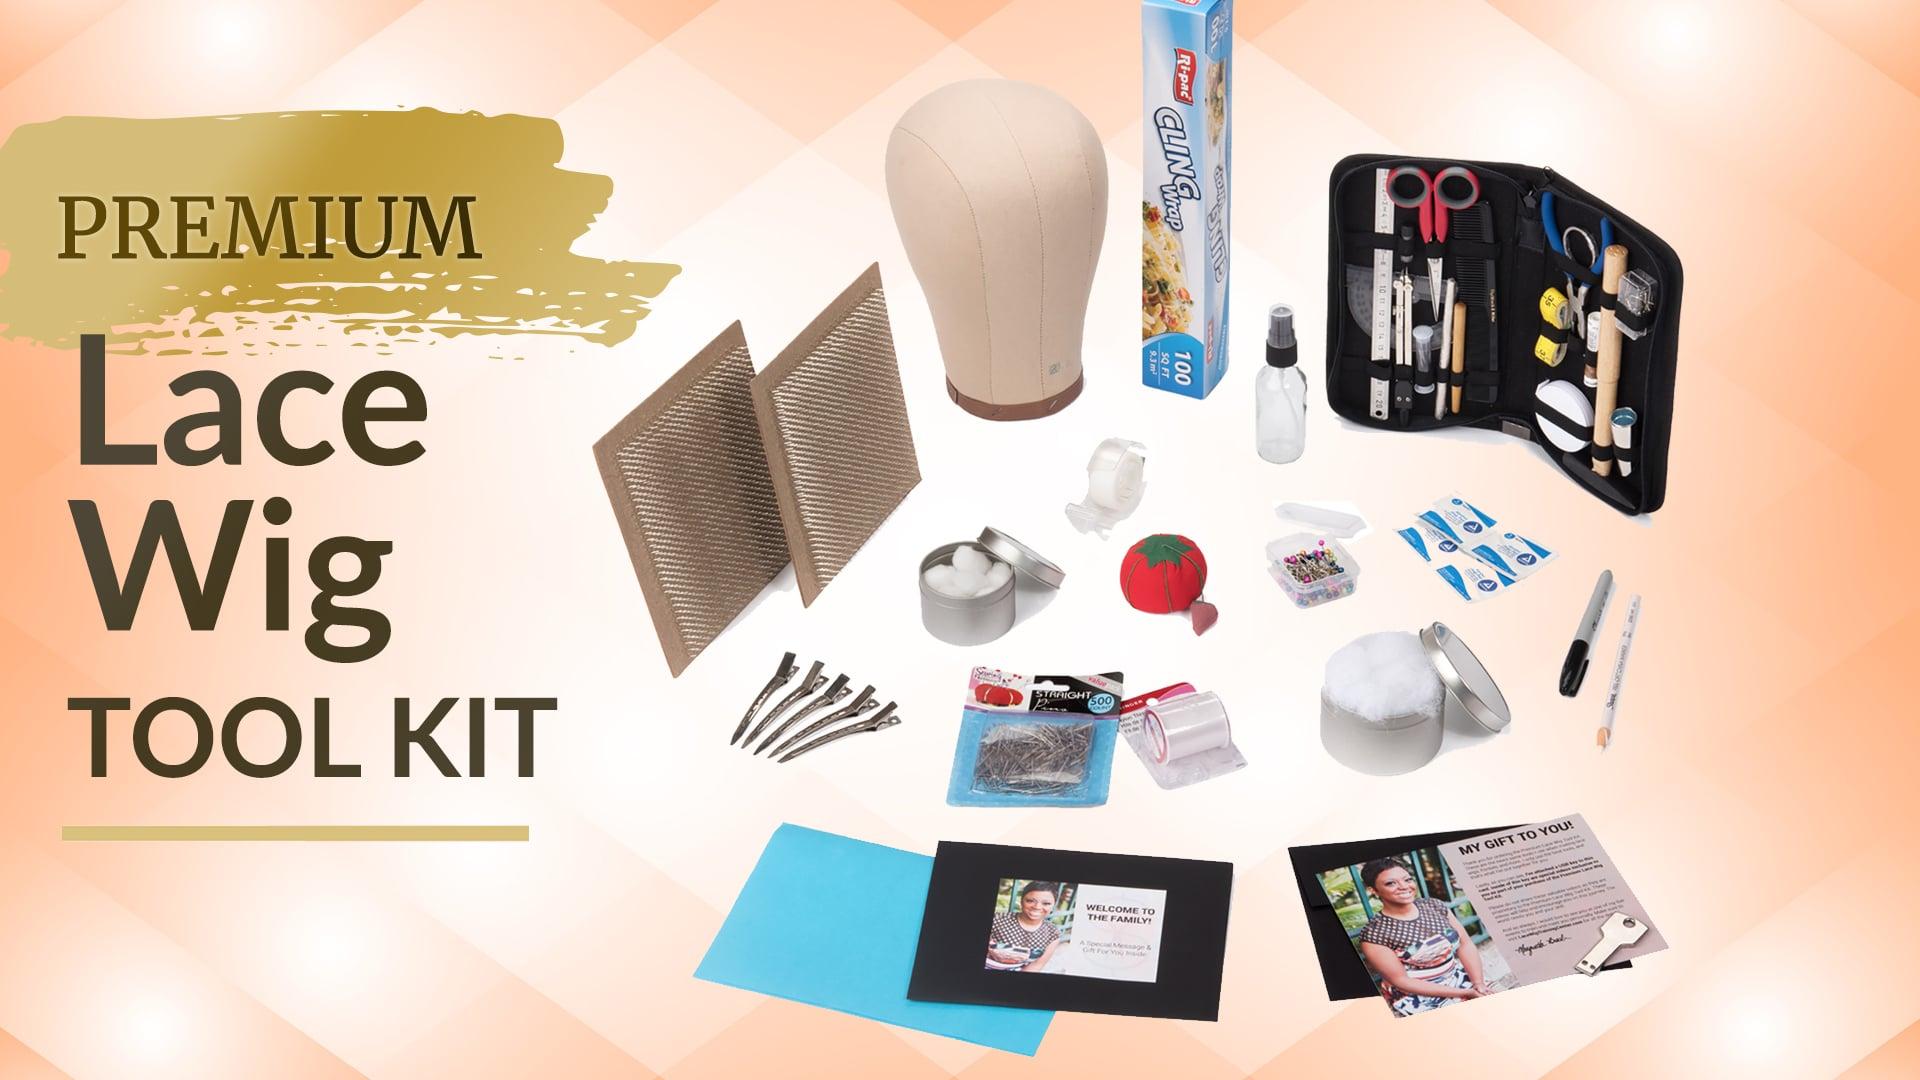 Premium Tool Kit